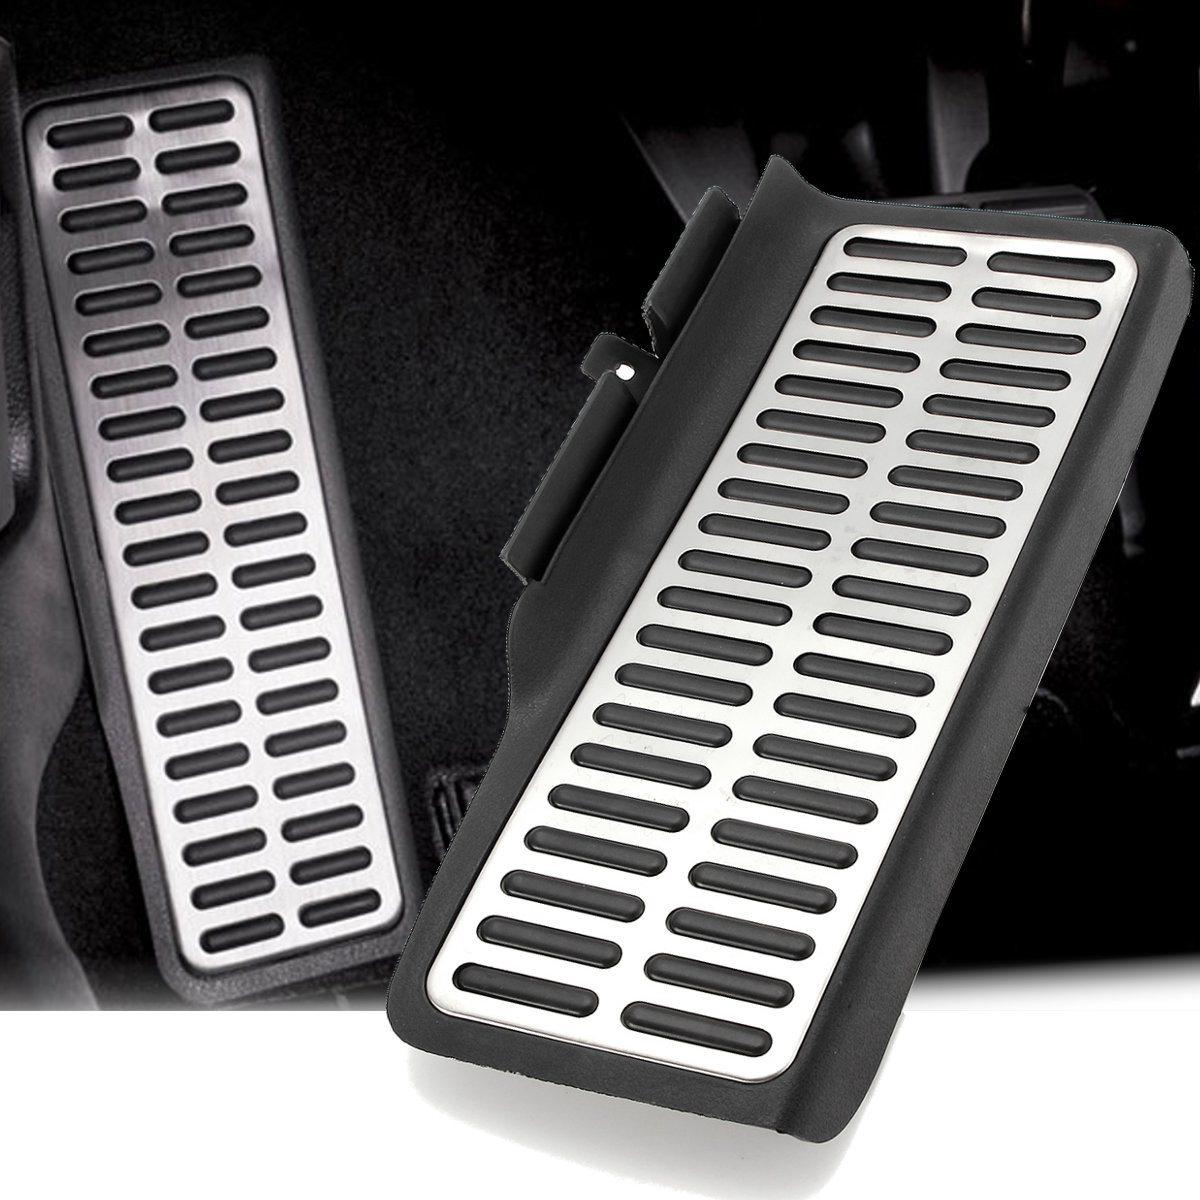 Foot Rest Dead Pedal Pad Aluminum For VW Volkswagen Jetta MK6 2011-2016 LHD